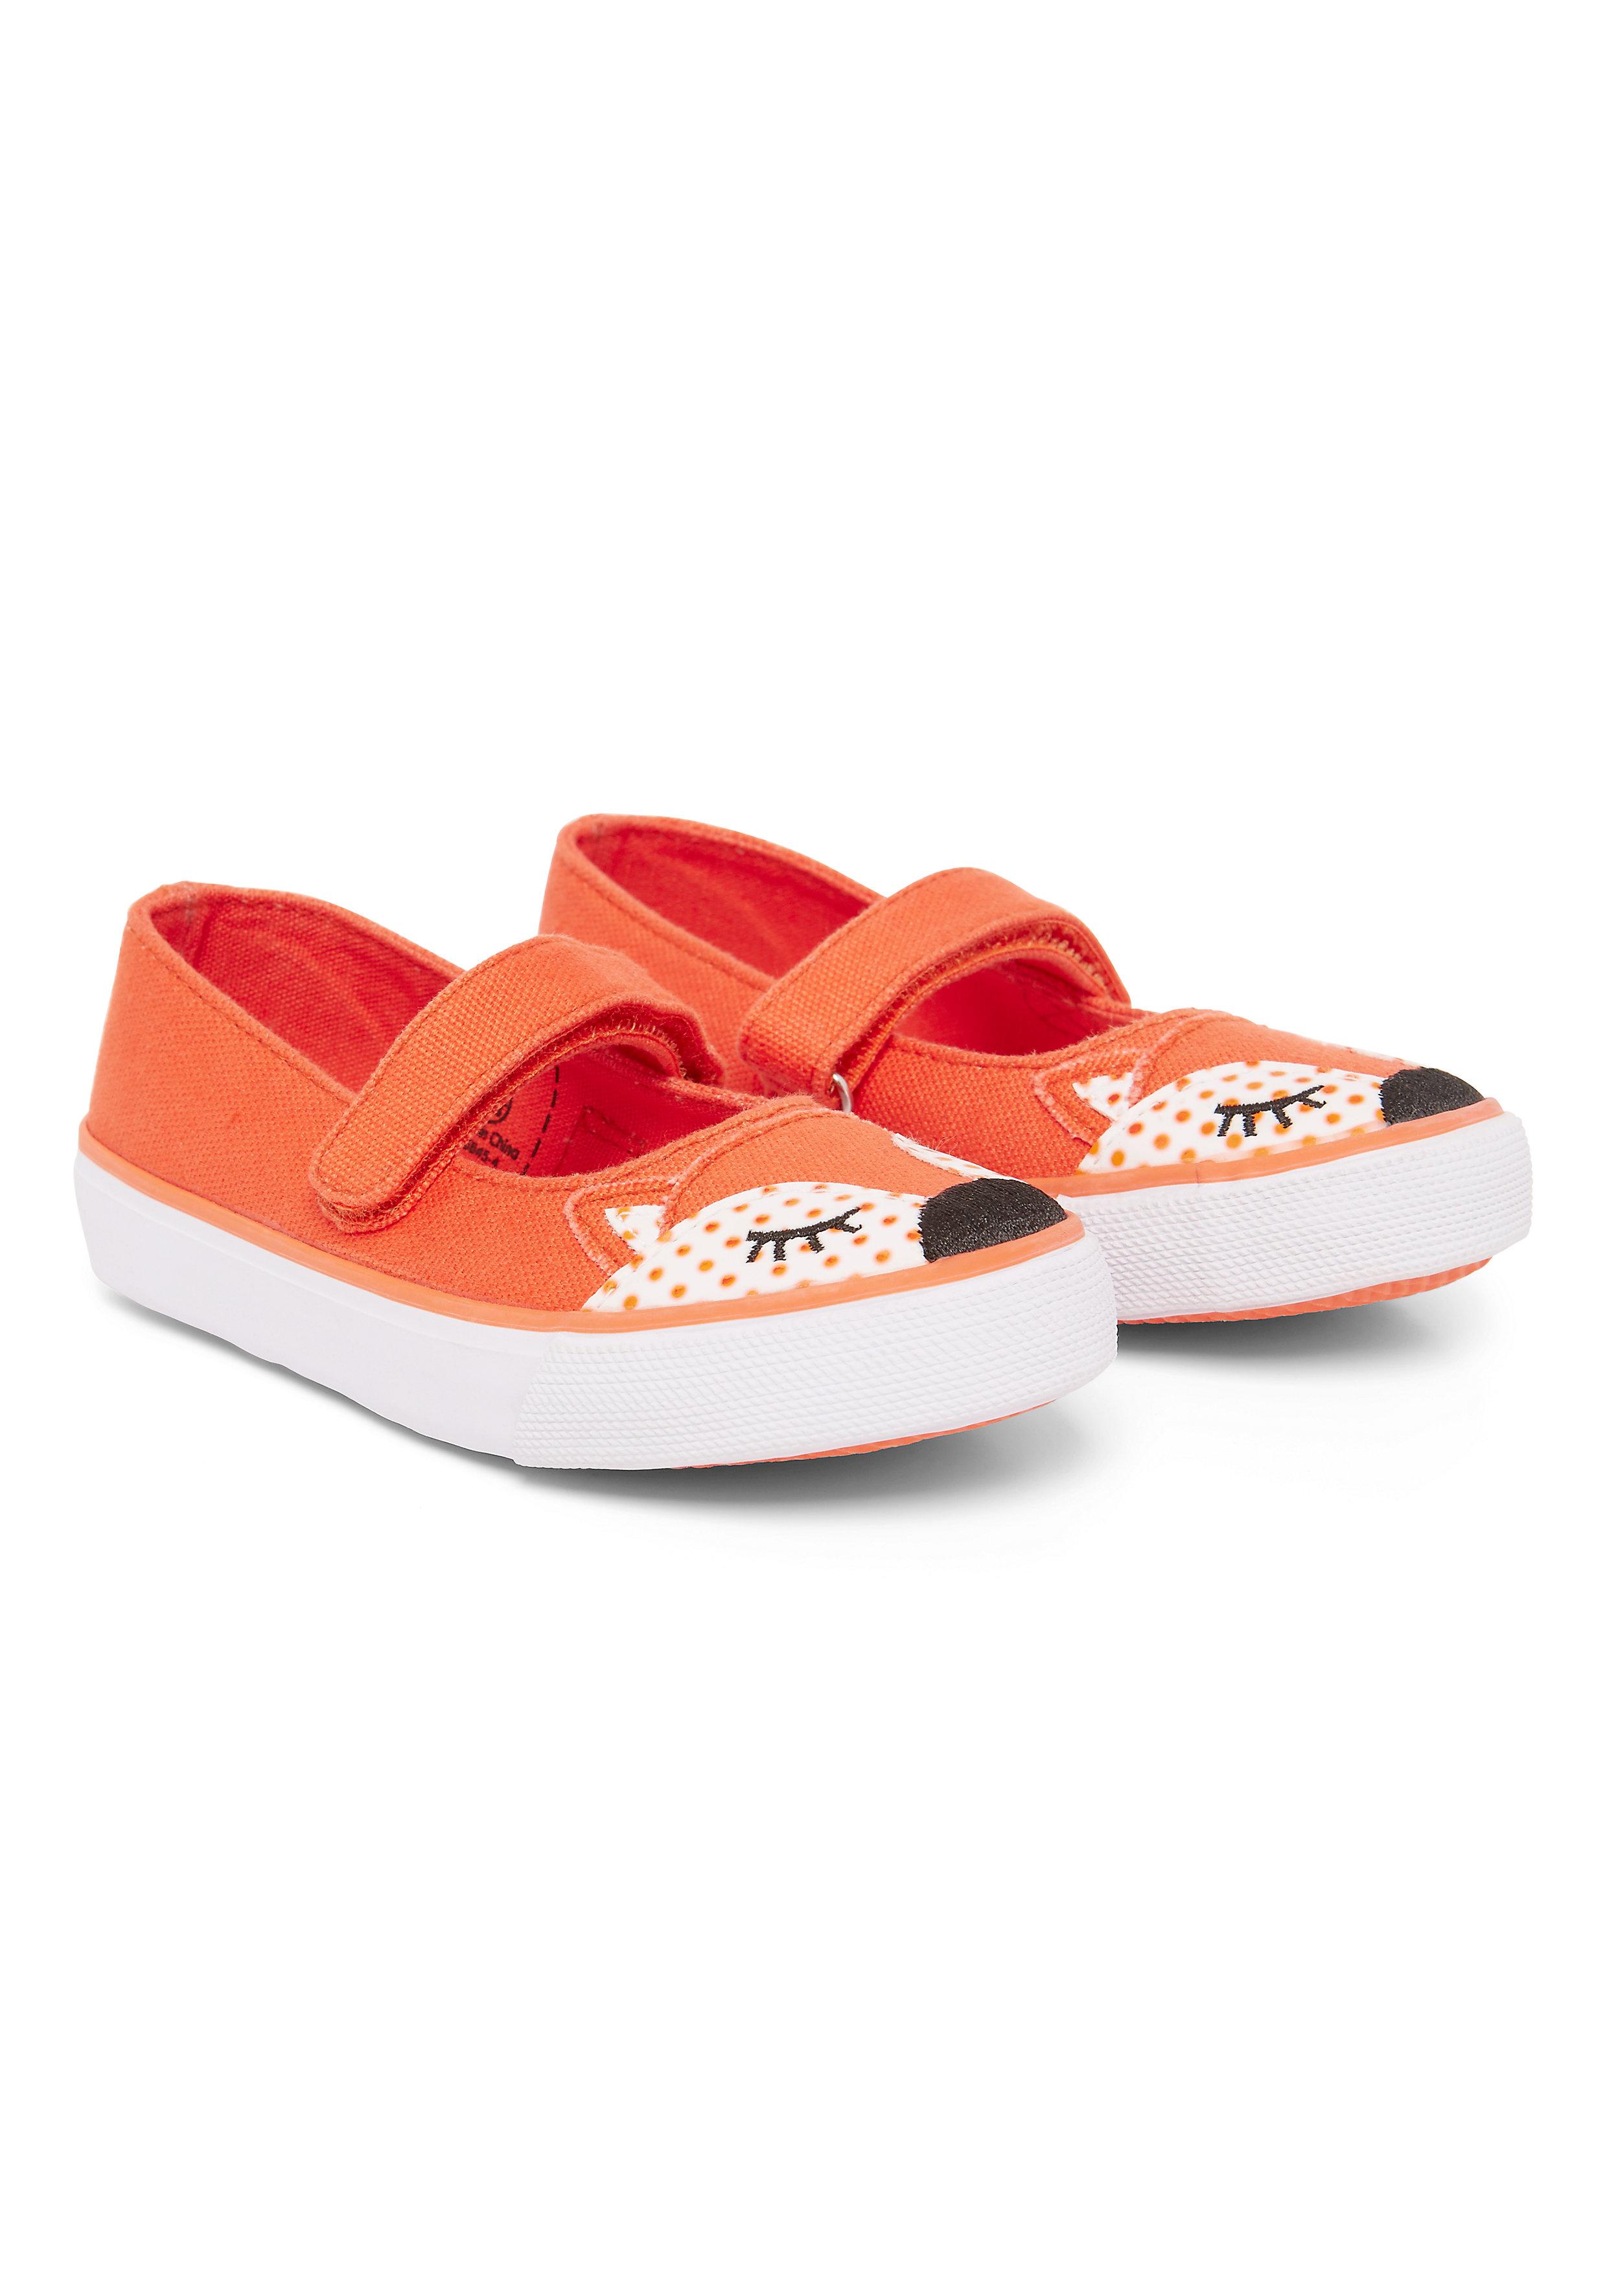 Mothercare | Girls Novelty Fox Canvas Shoes - Orange